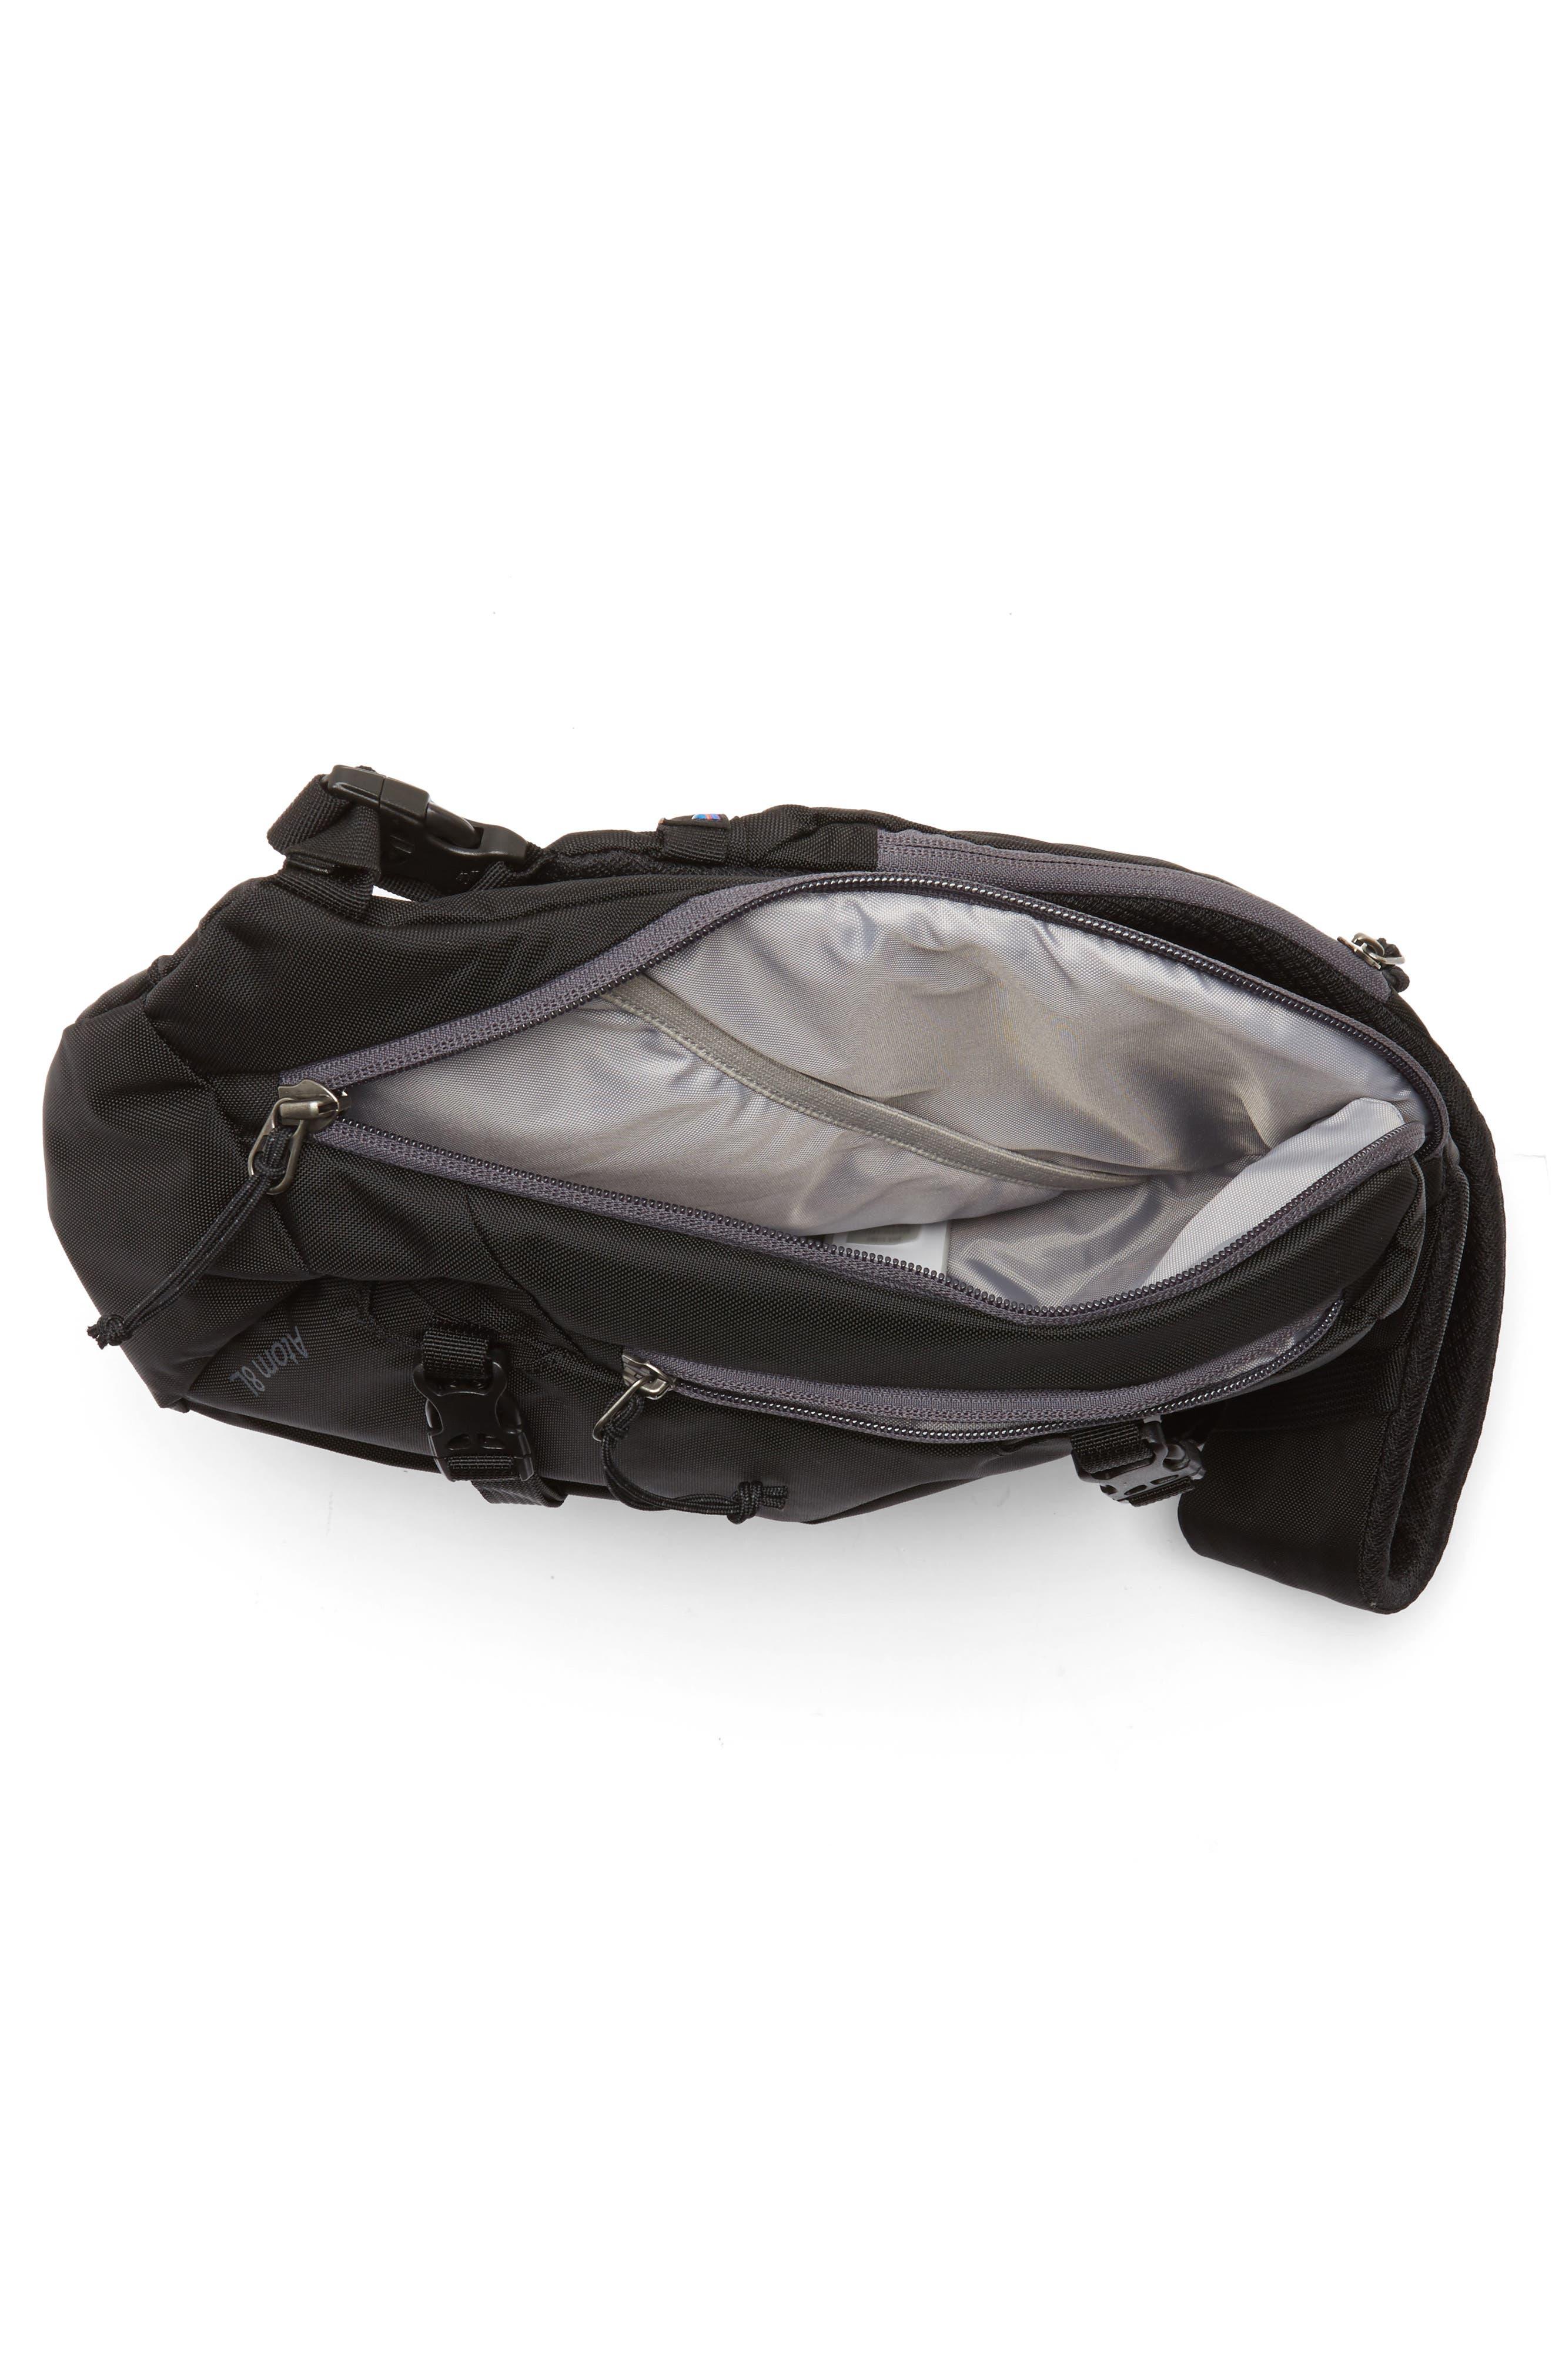 PATAGONIA, Atom 8L Sling Backpack, Alternate thumbnail 5, color, BLACK